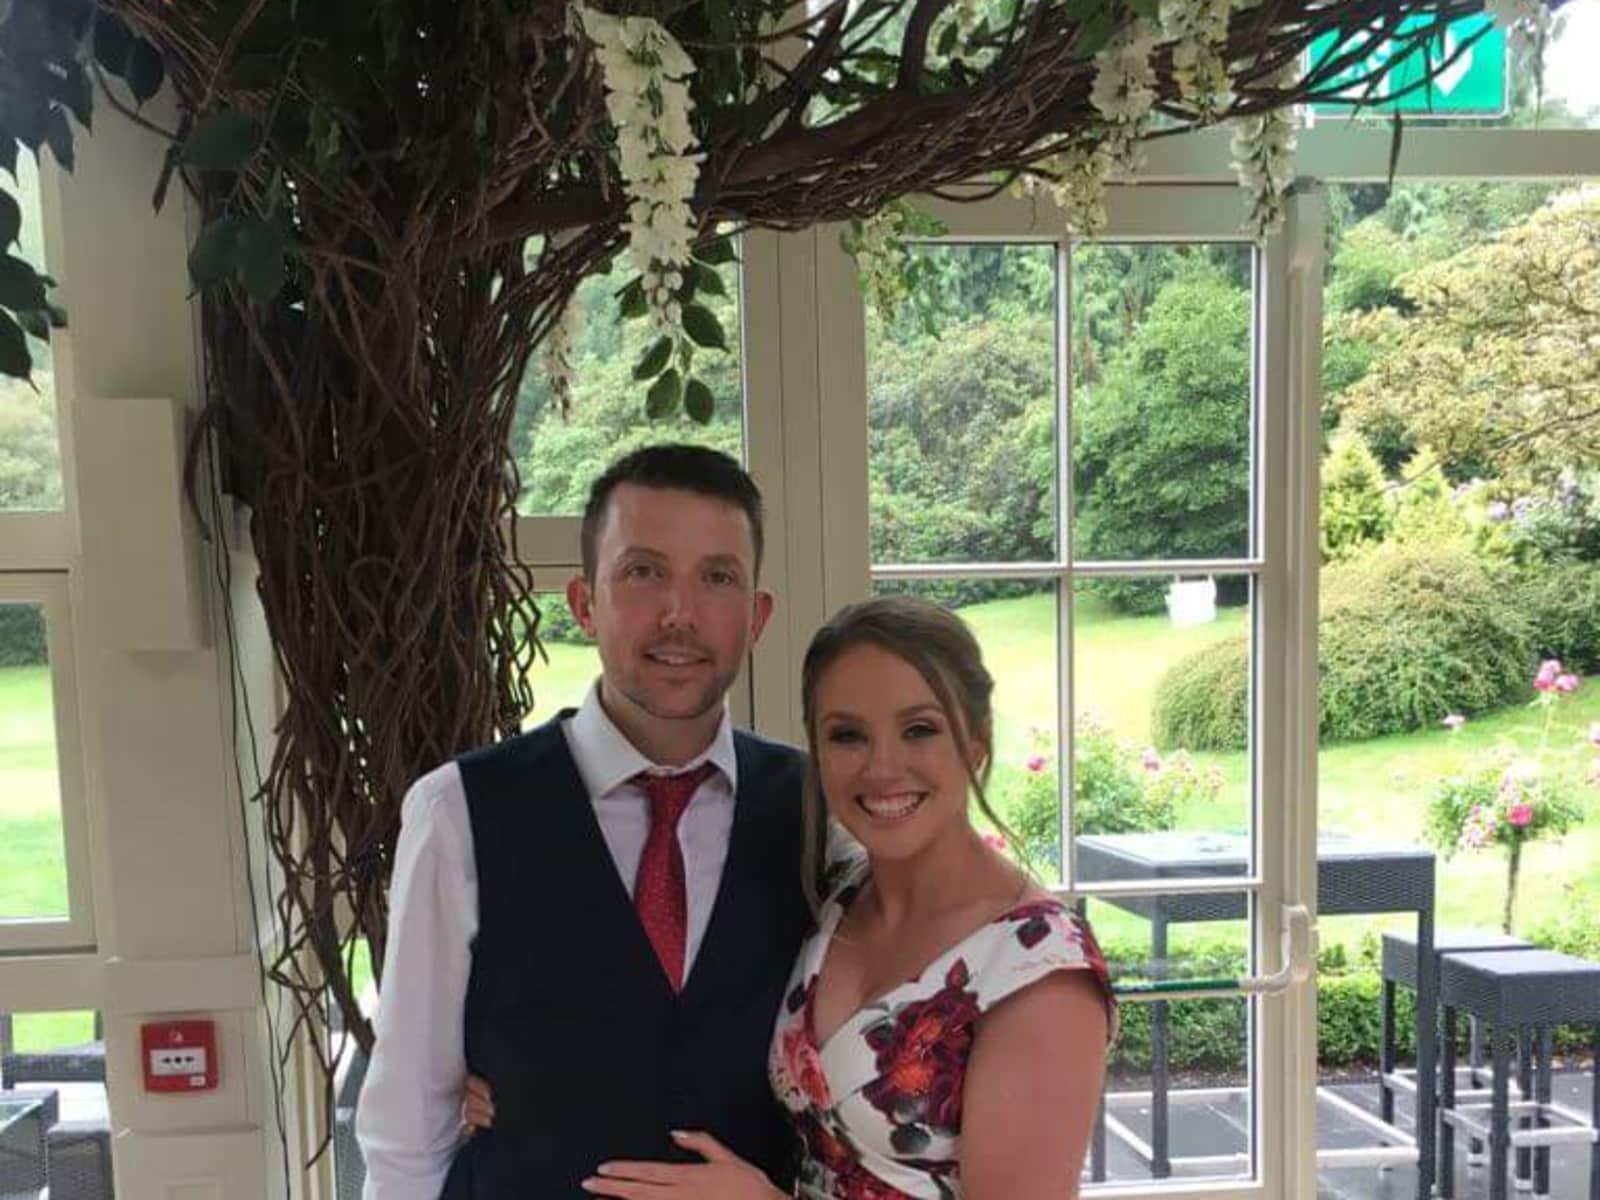 Mary ellen & Niall from Kilmessan, Ireland